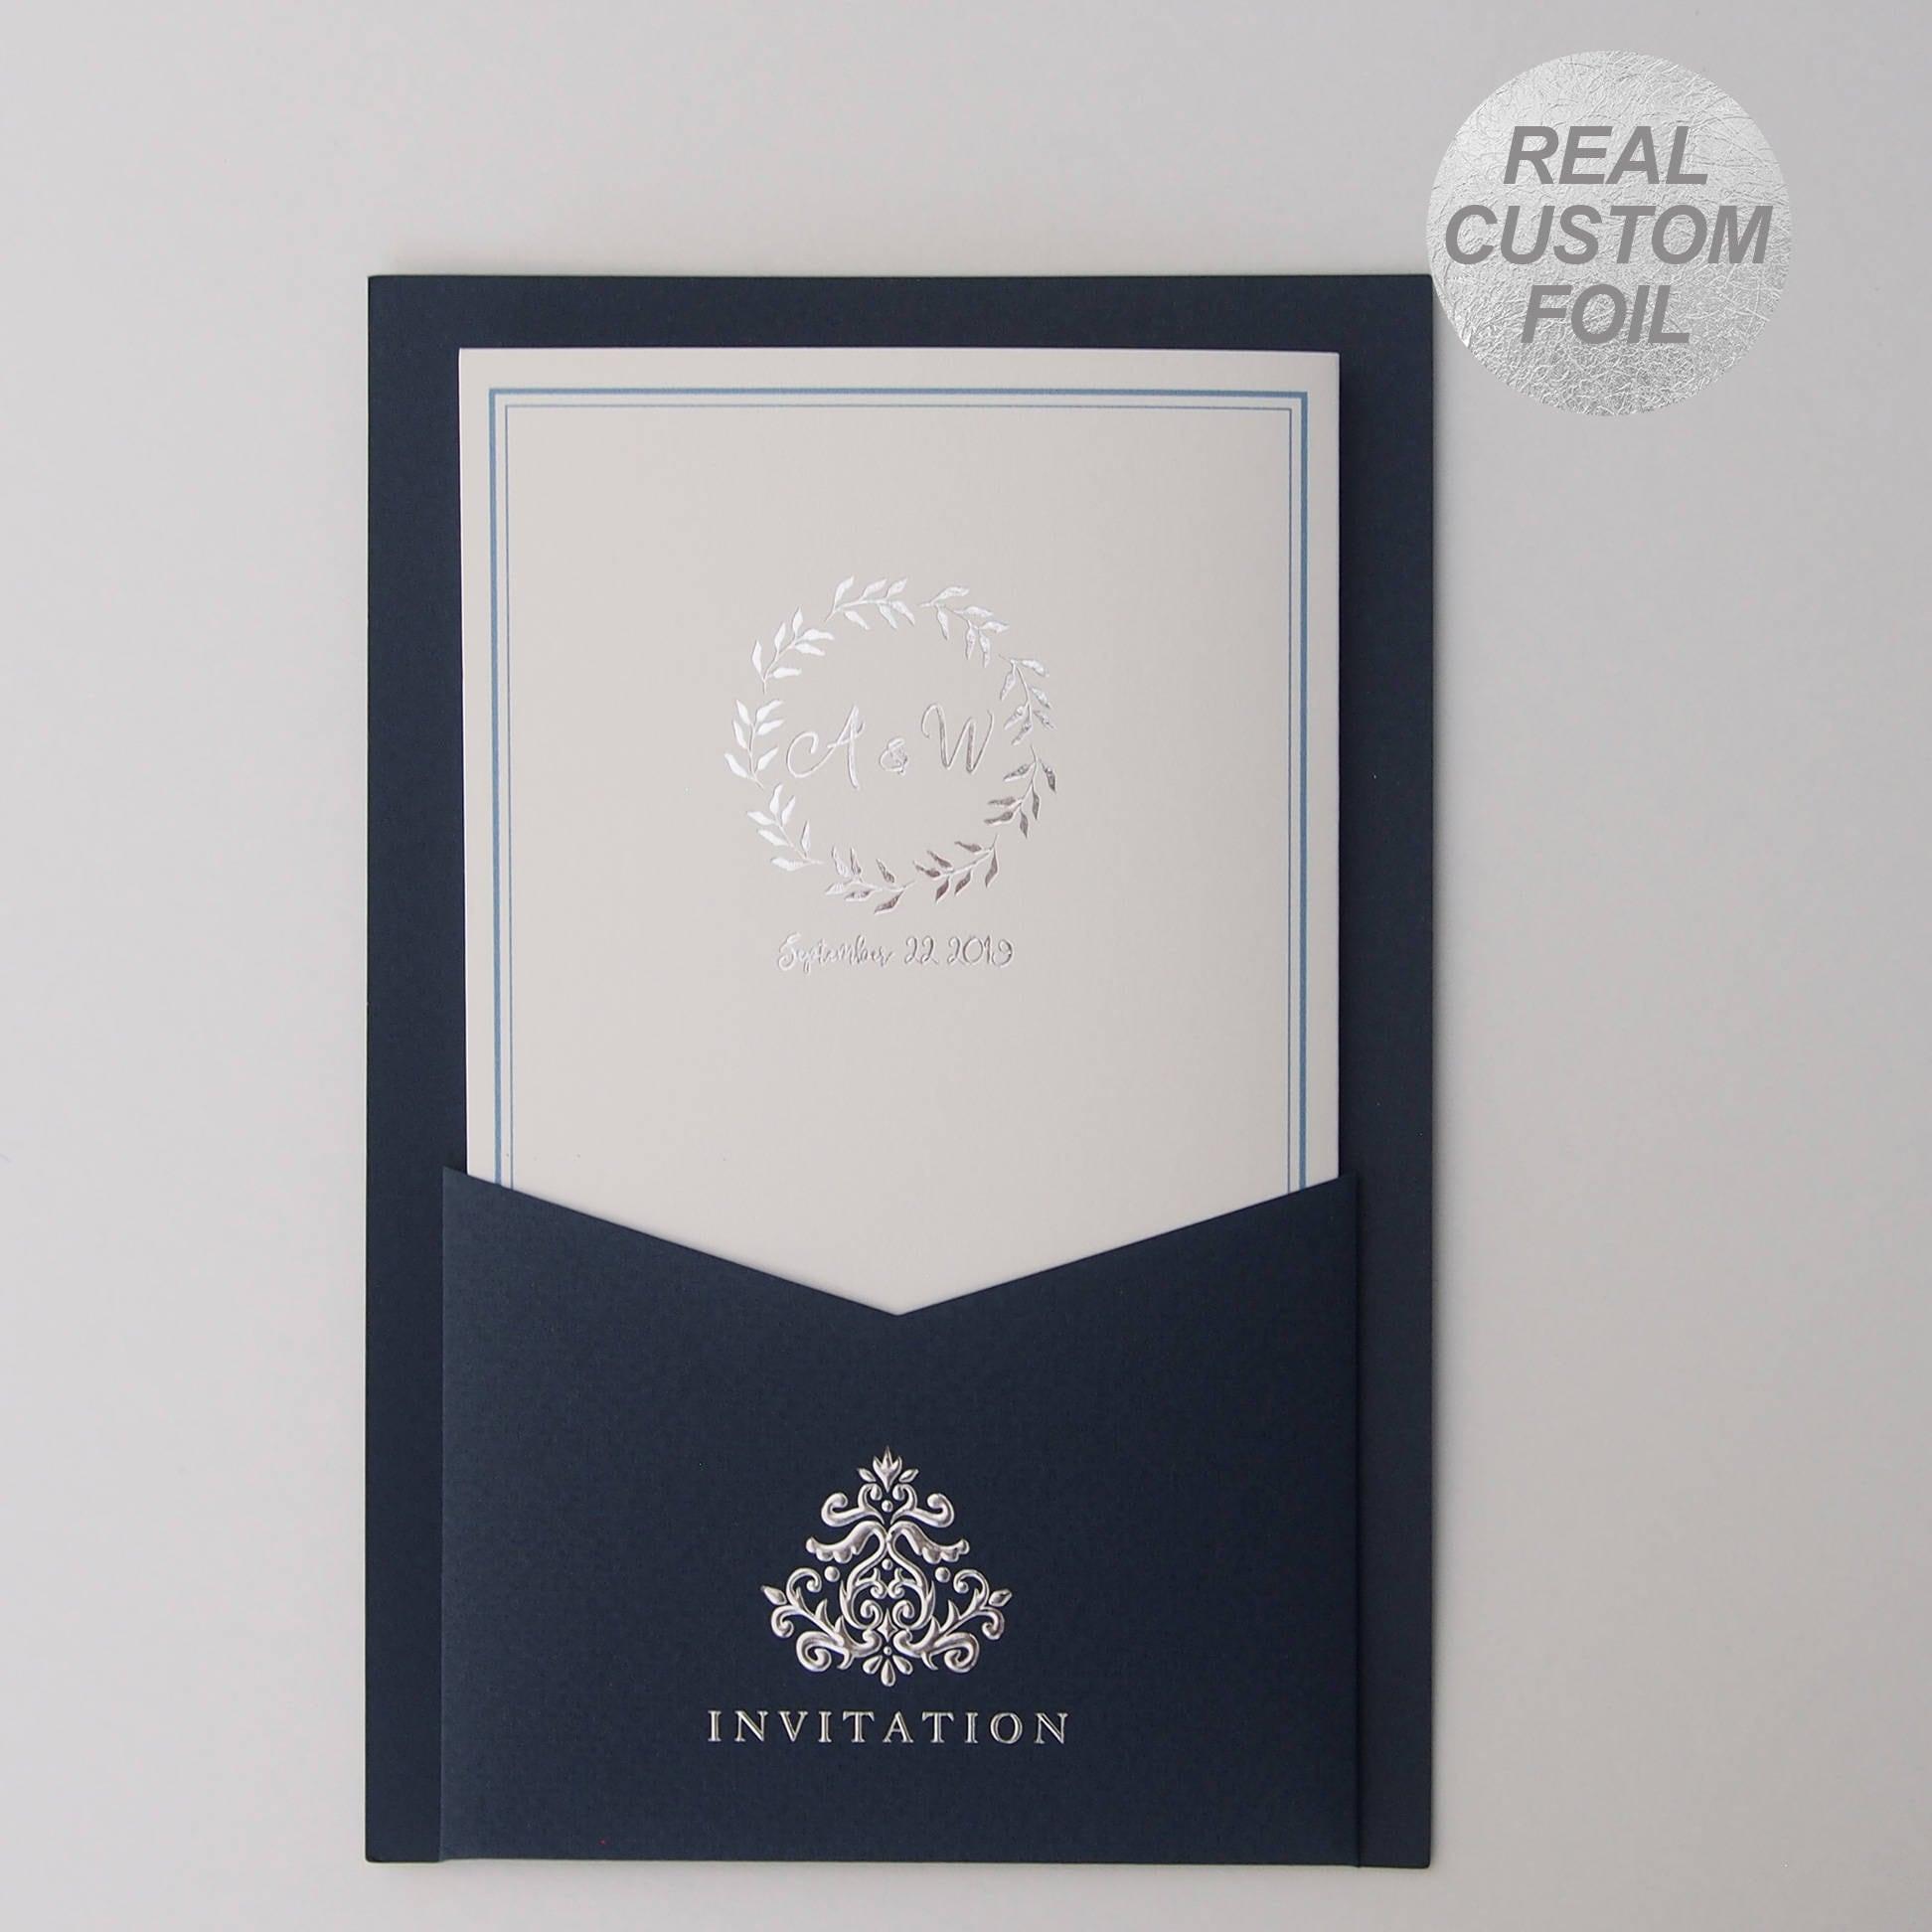 Custom Silver foil wedding invitations Blue Pocket All in one ...